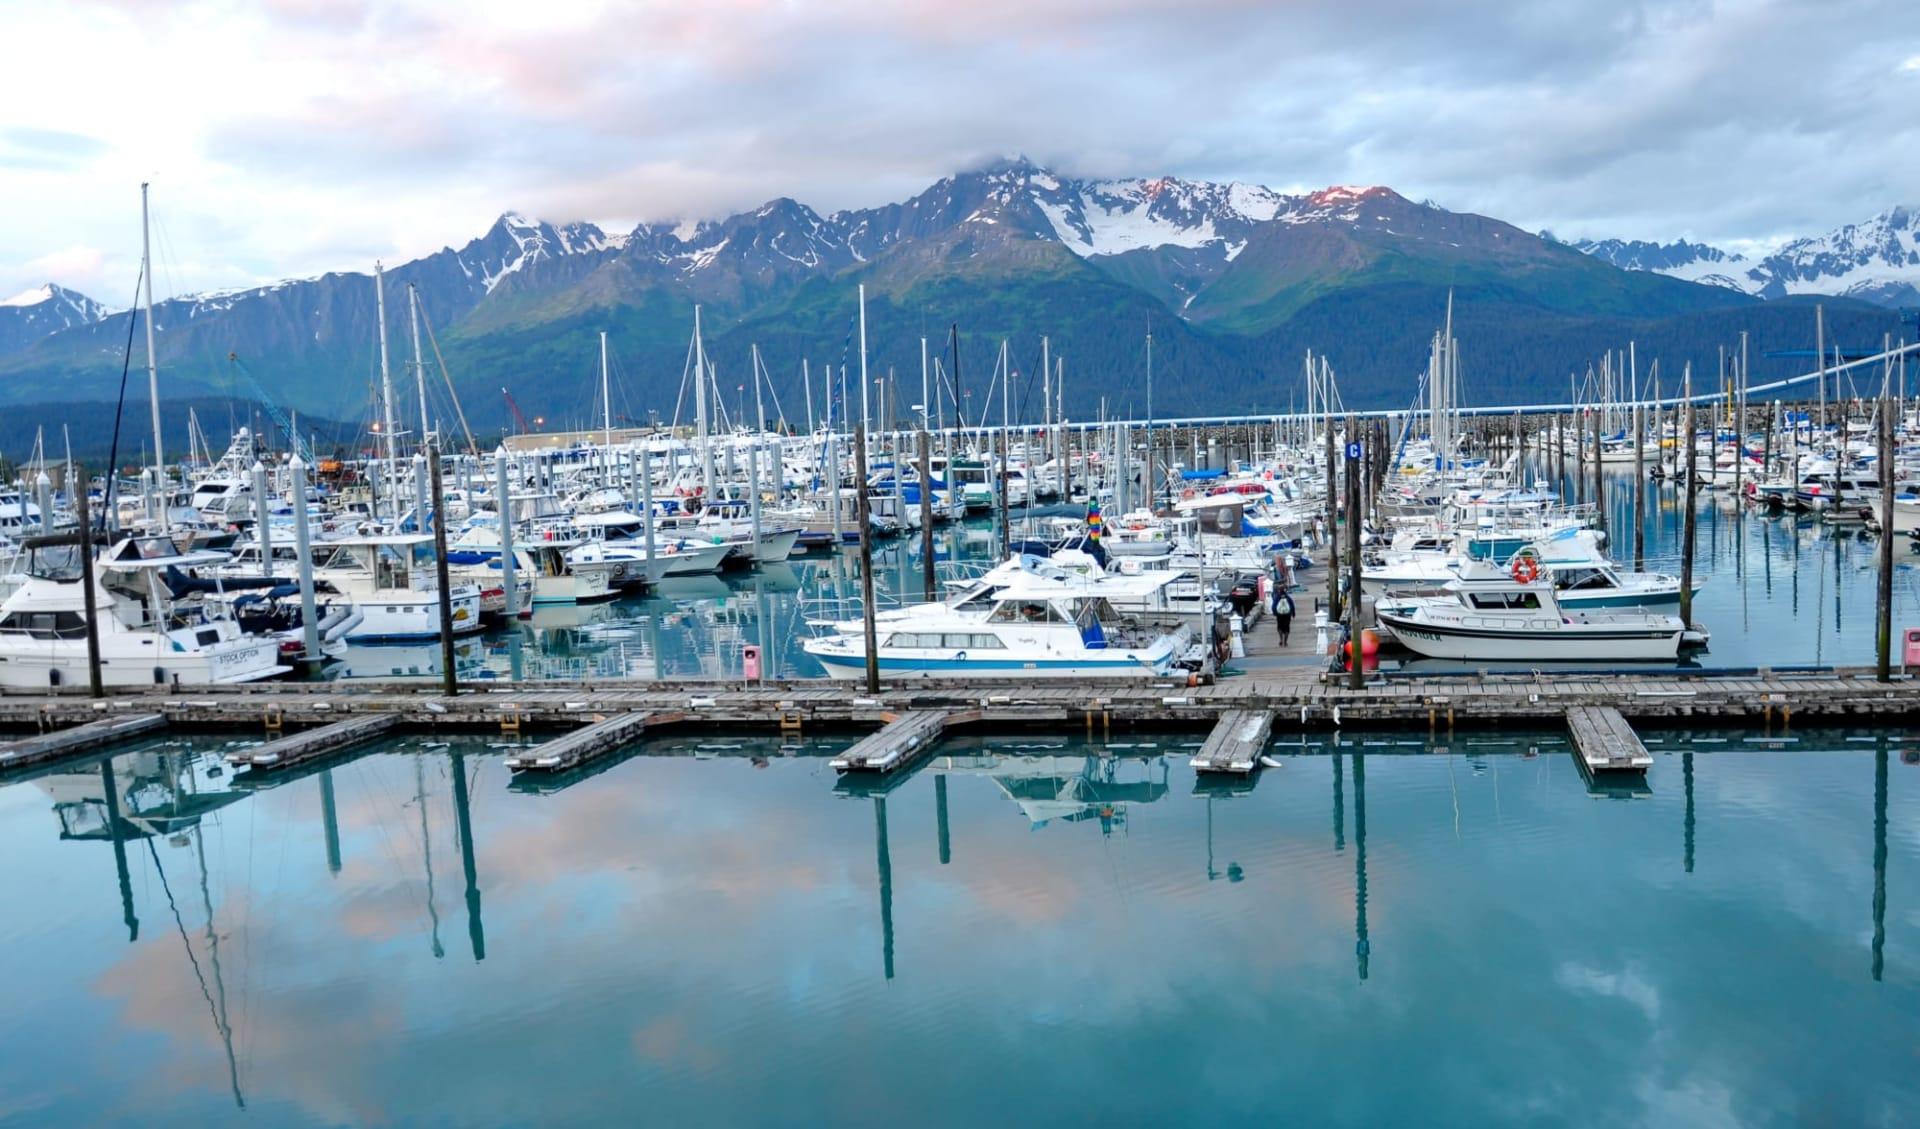 Breeze Inn Seward Alaska: shutterstock_385546264_seward